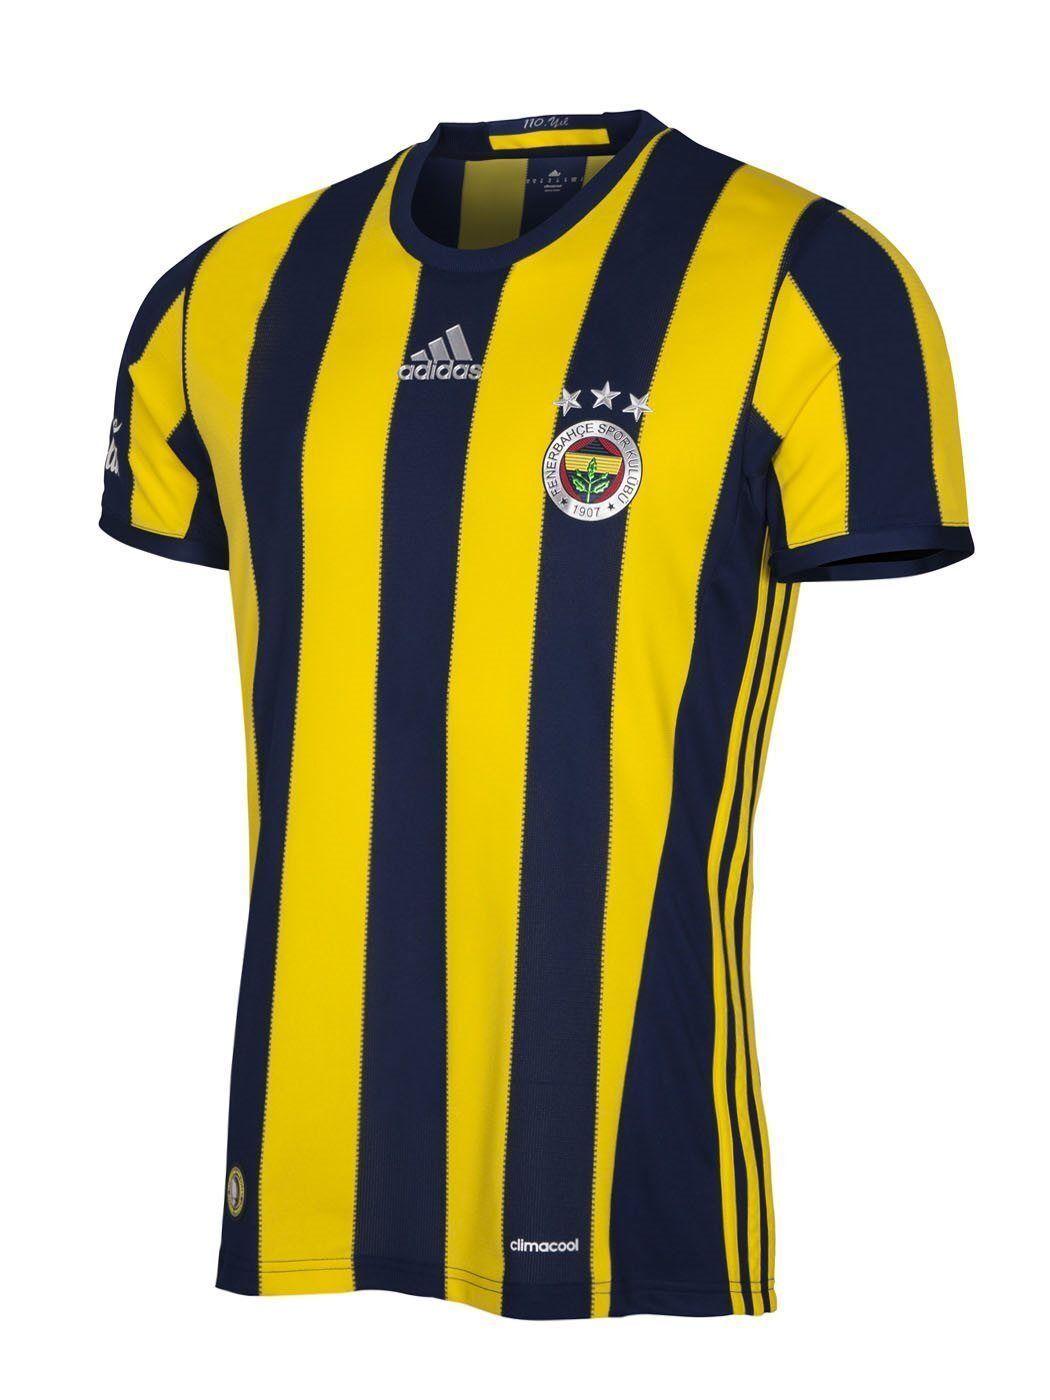 Authentic Adidas Fenerbahce 201617 con licenza HtuttiEY COCA COLA 110 anni YIL S